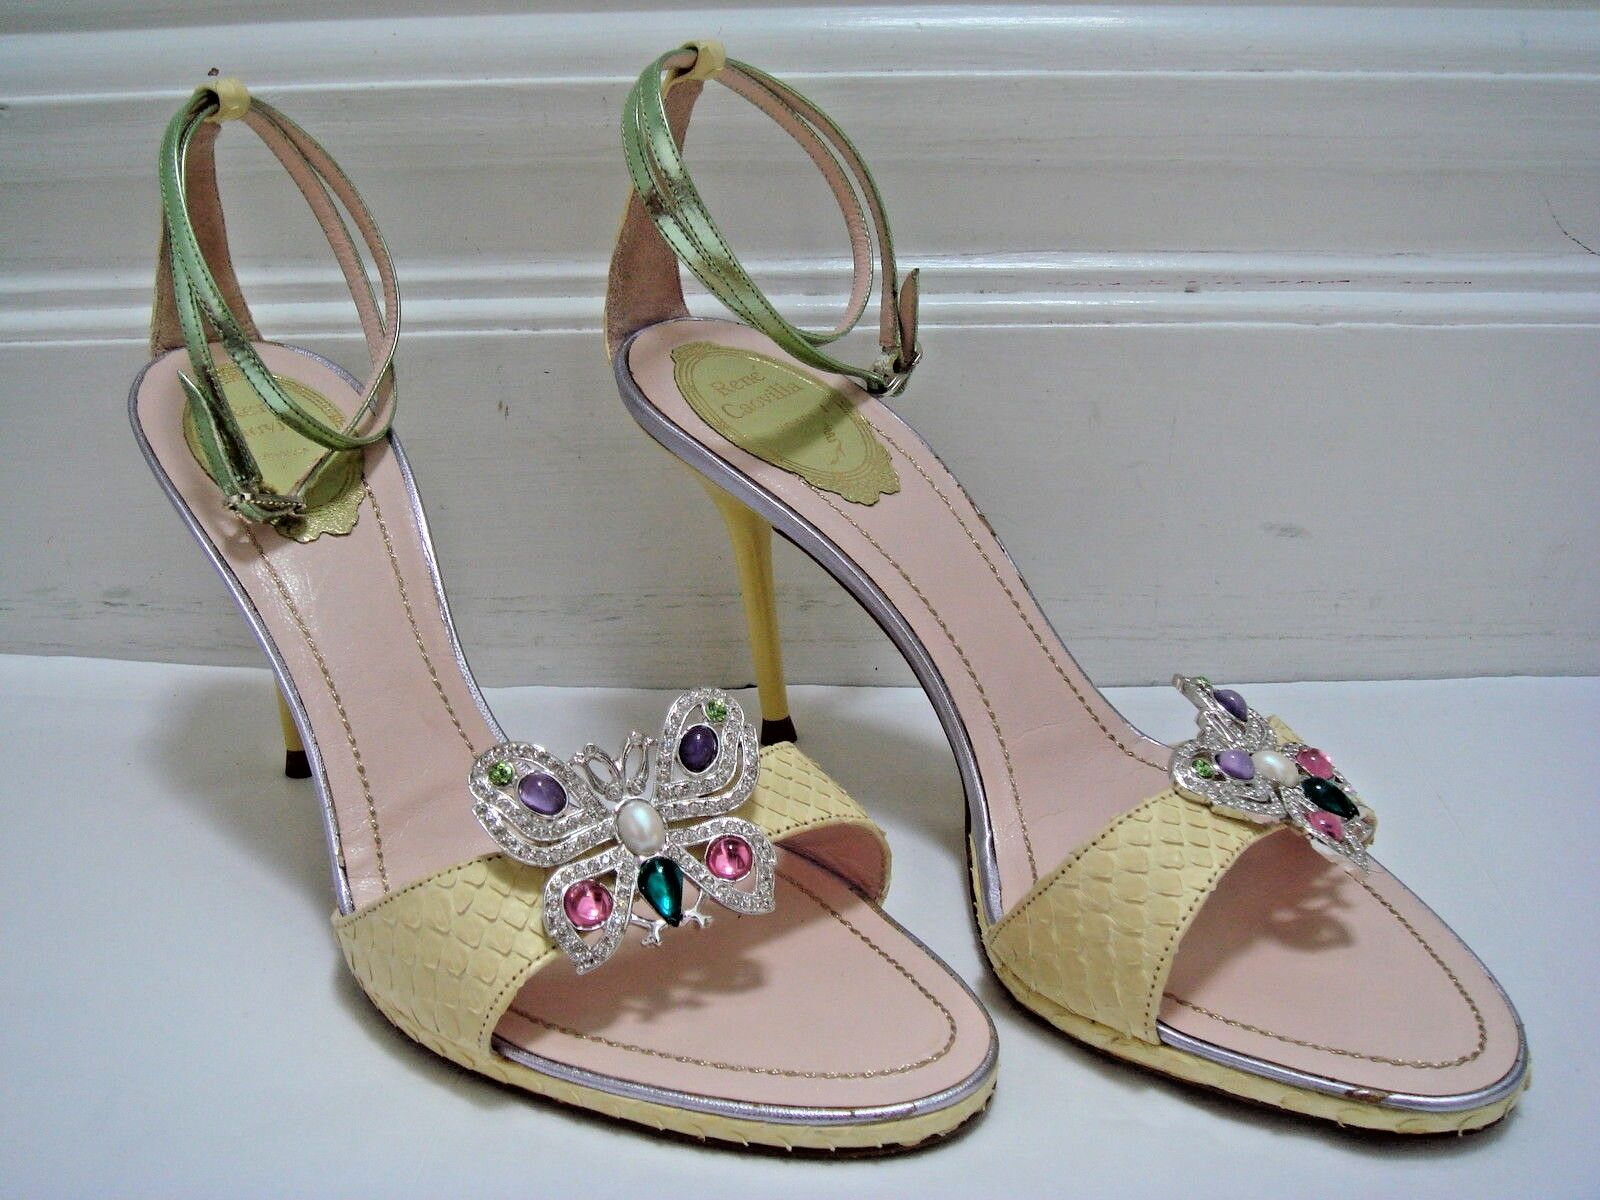 NEW RENE CAOVILLA  1050 python rhinestone butterfly heels sandals Italian 40 9.5